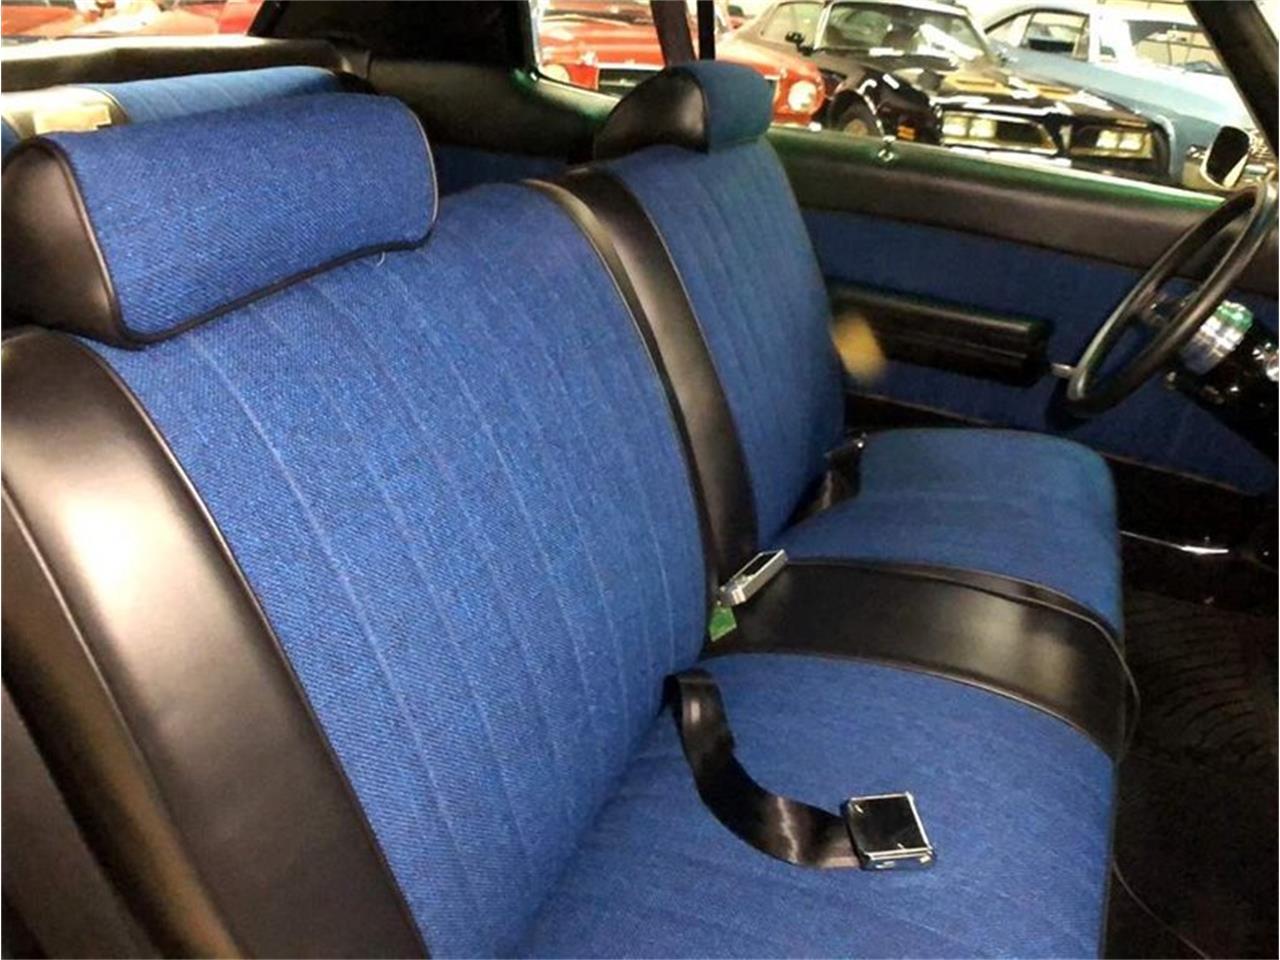 1969 Chevrolet Impala (CC-1298554) for sale in Gurnee, Illinois